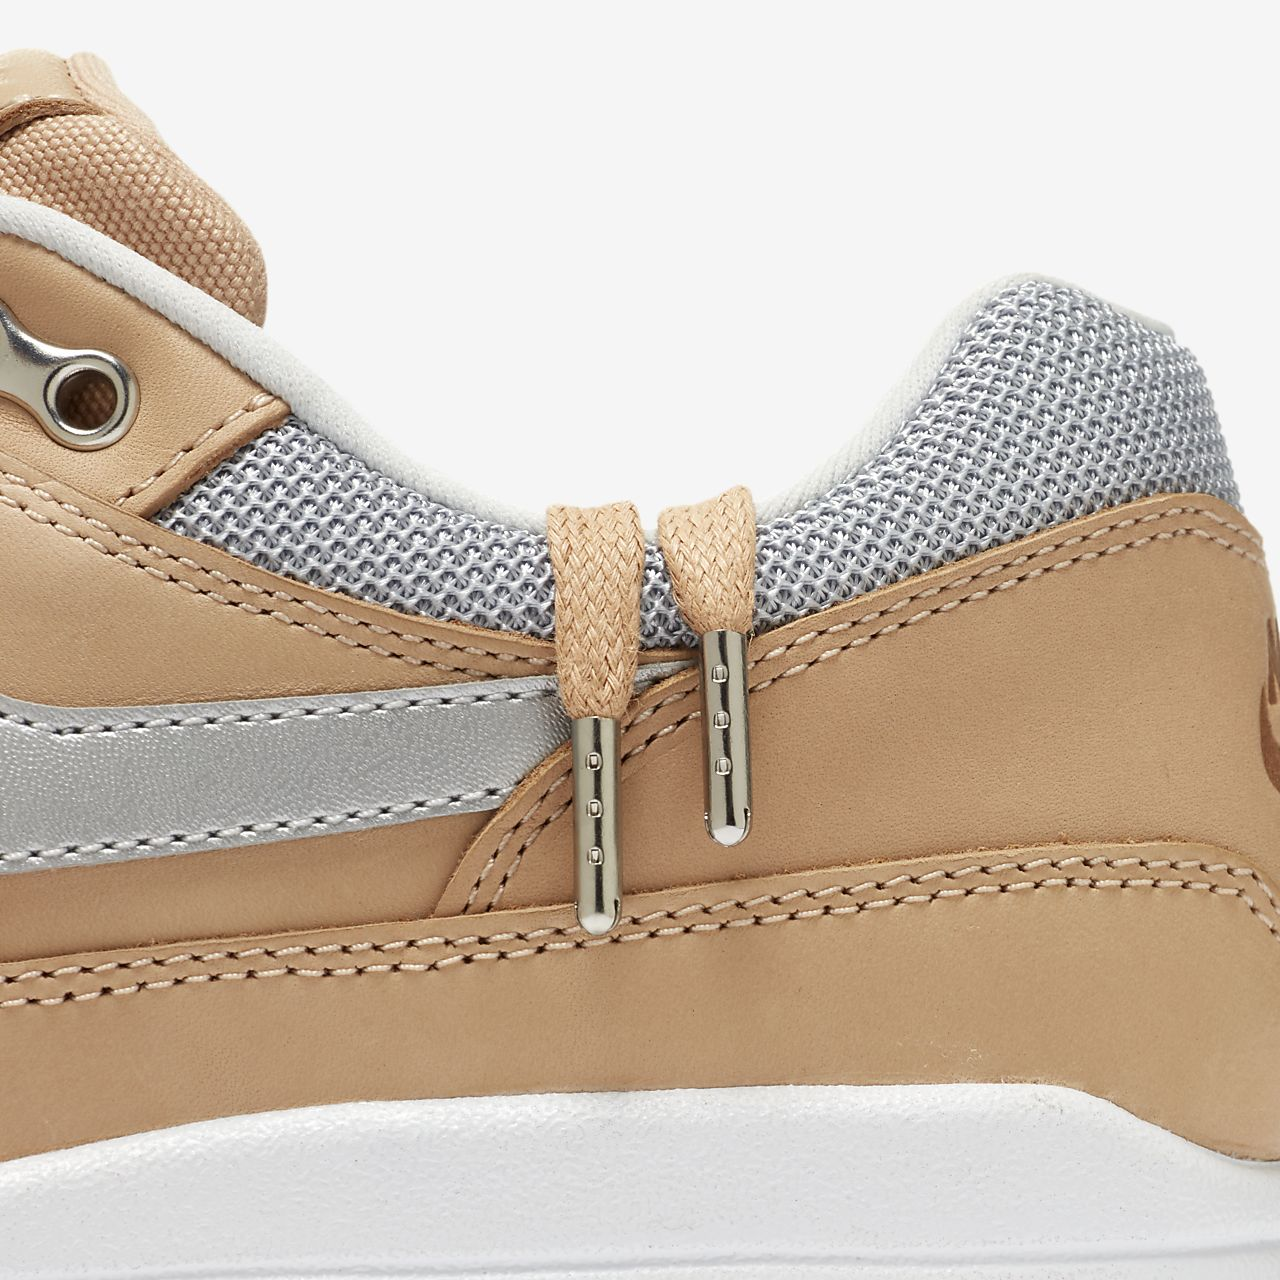 Nike Air Max 1 SE PRM Damenschuh